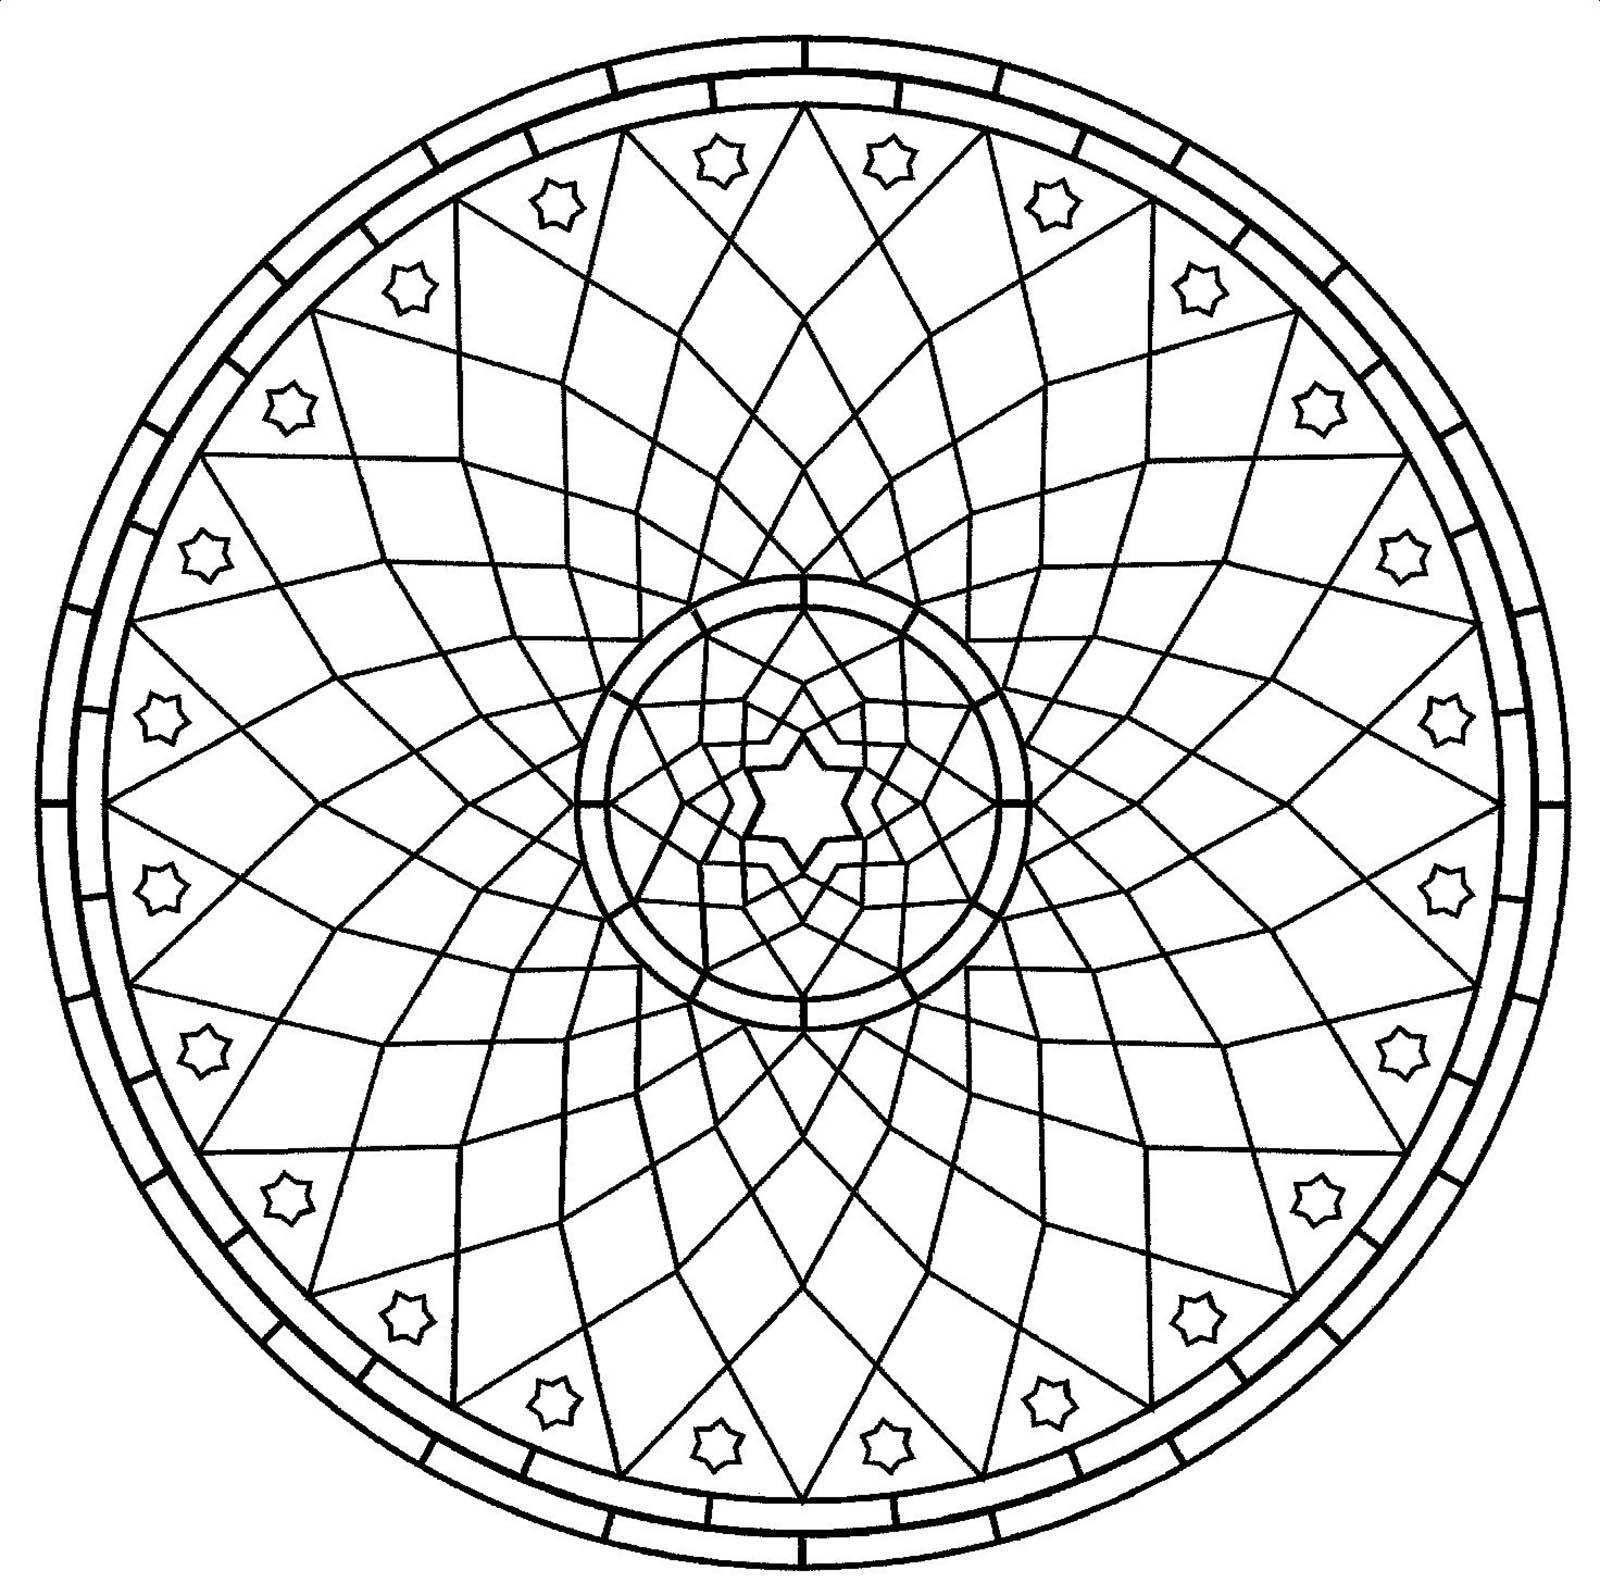 Mandala To Download Rosace - Simple Mandalas - 100% Mandalas encequiconcerne Image De Rosace